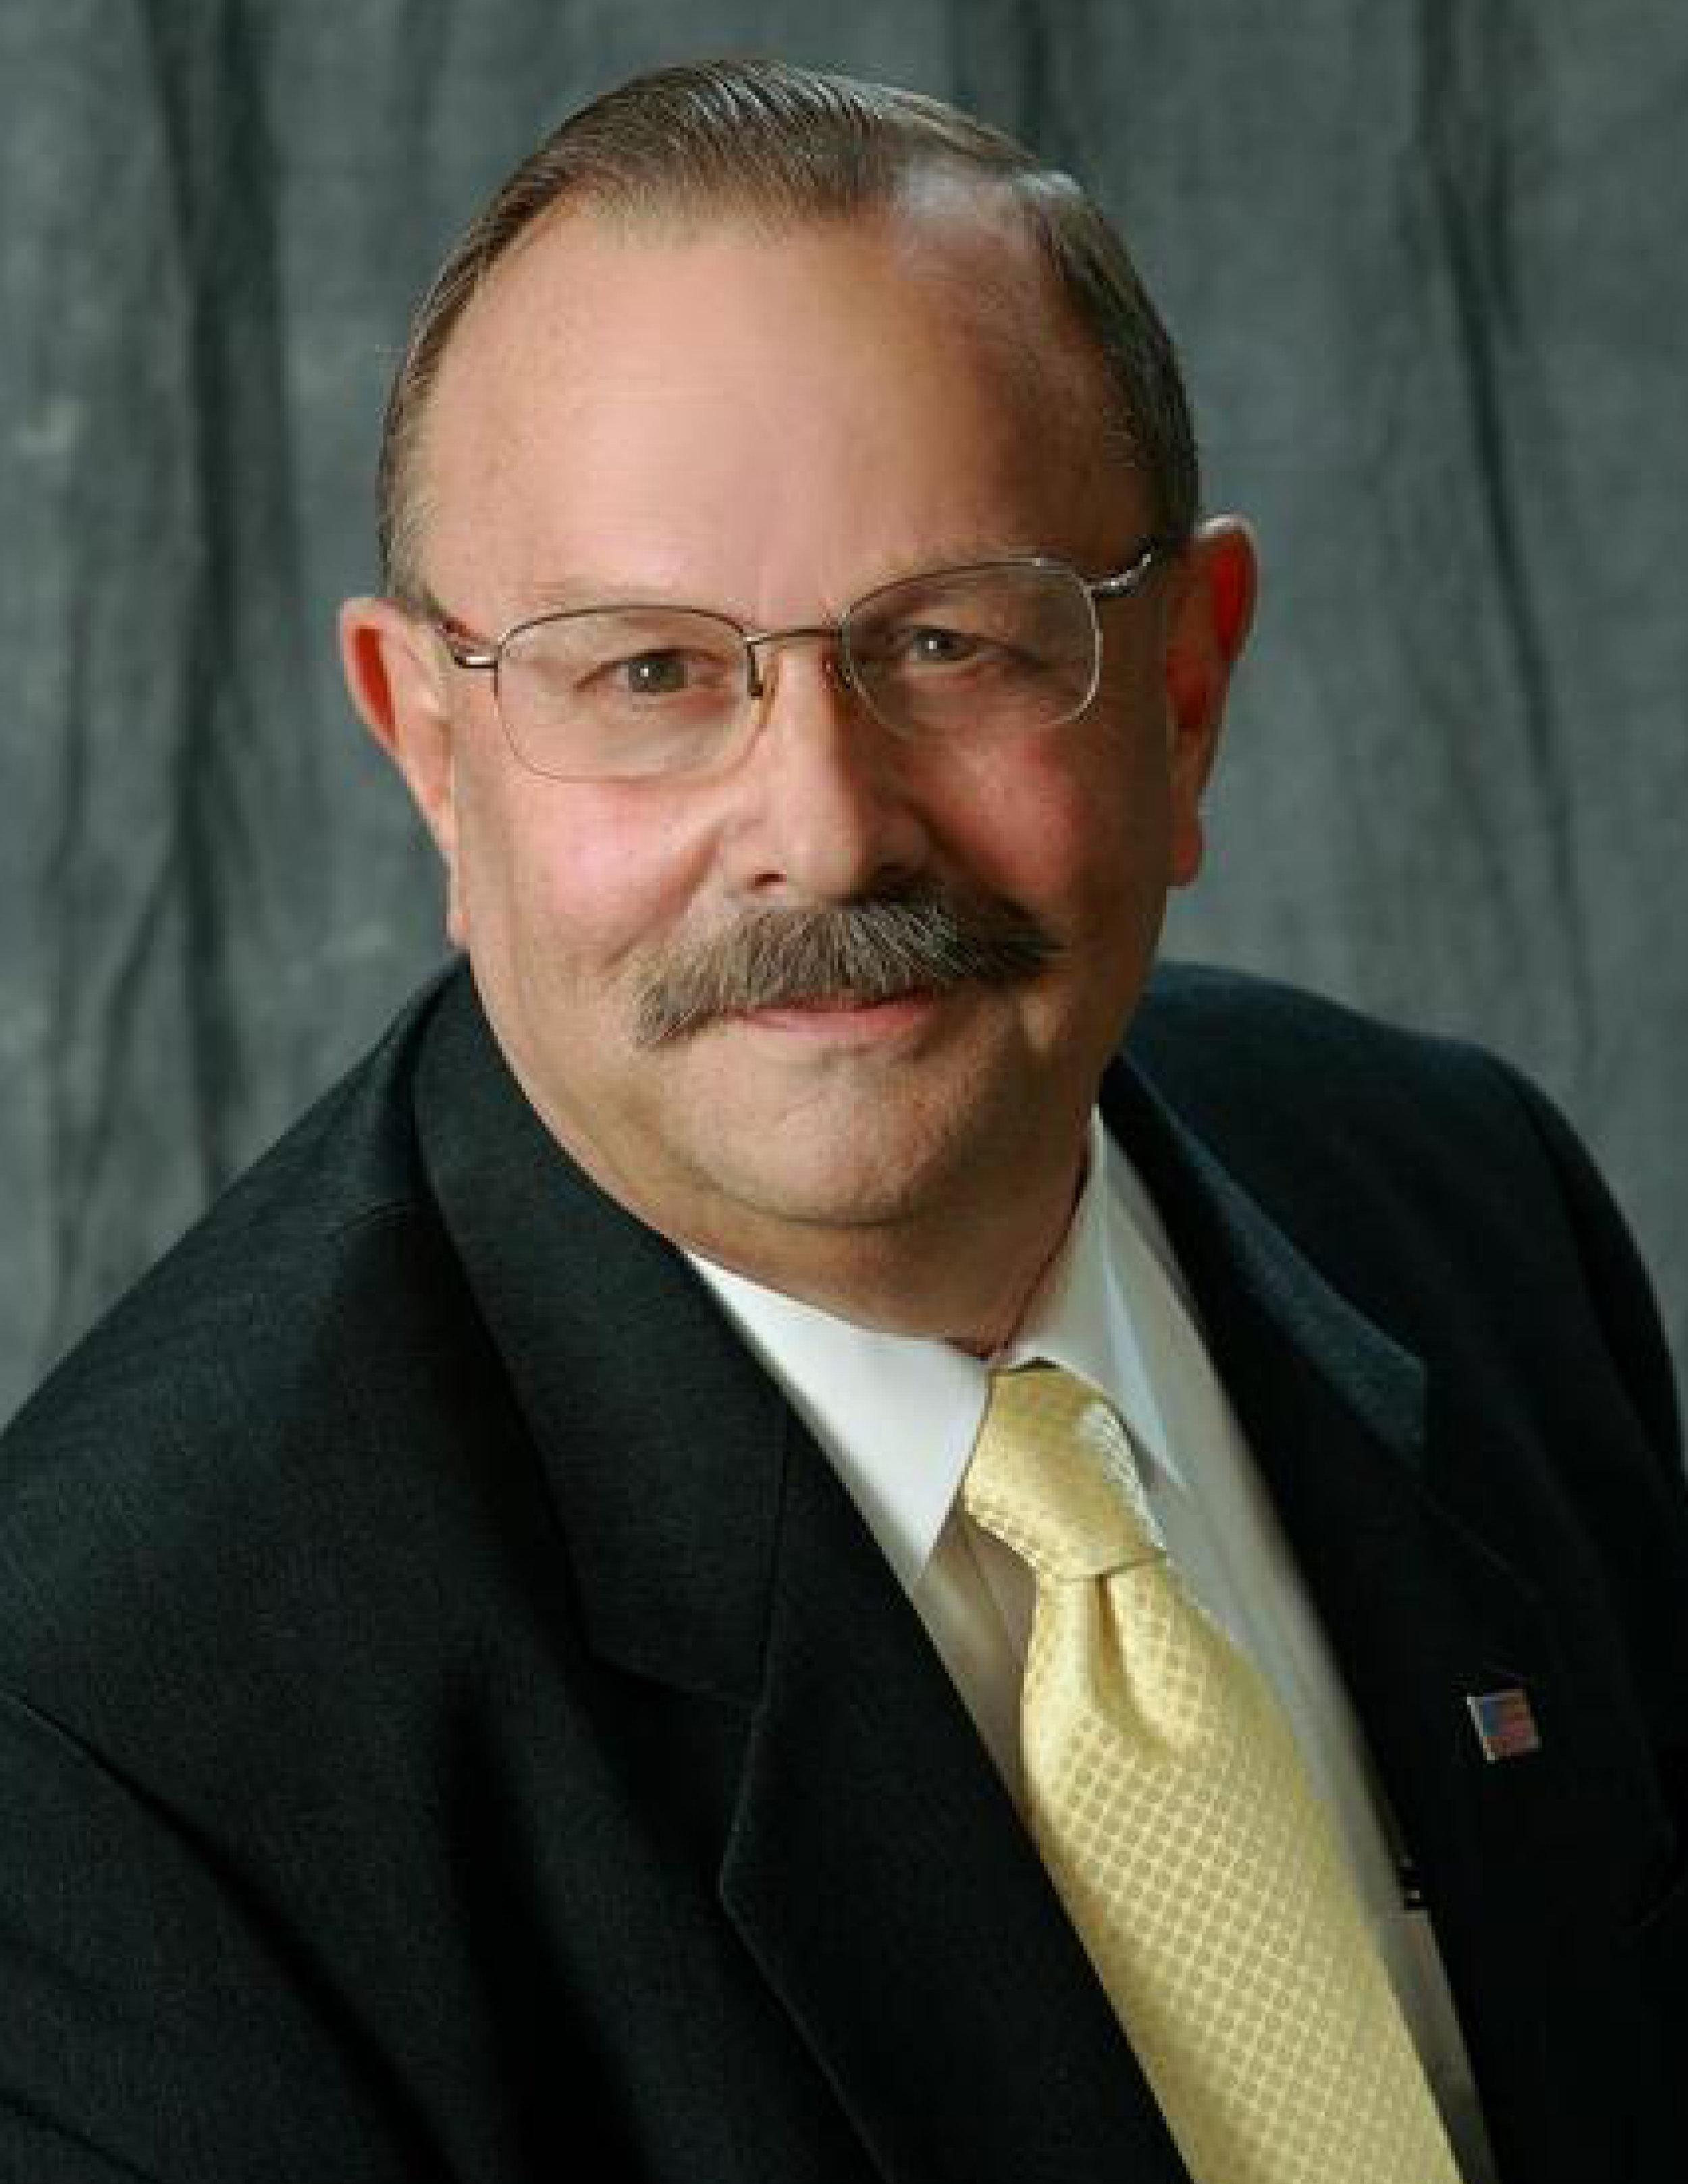 David Baker - Kenmore Mayor